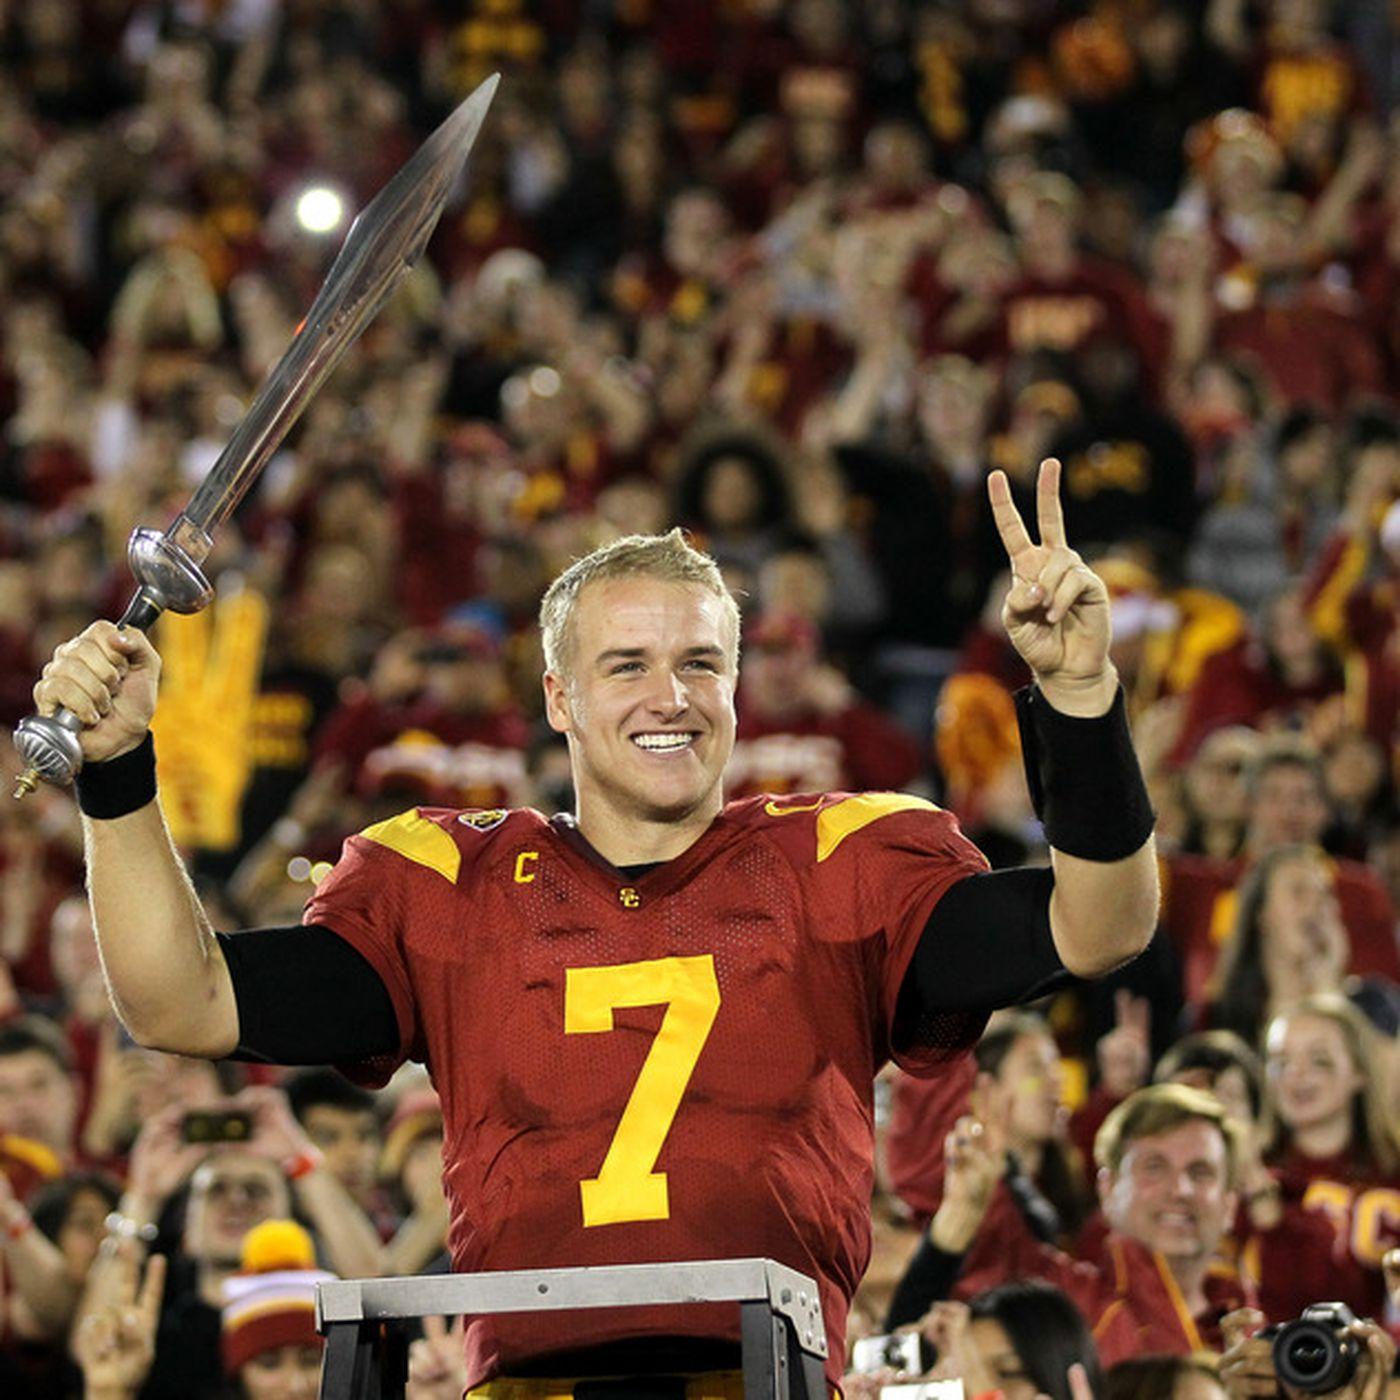 Matt Barkley Announces He Will Stay At USC, Forgo 2012 NFL Draft ...